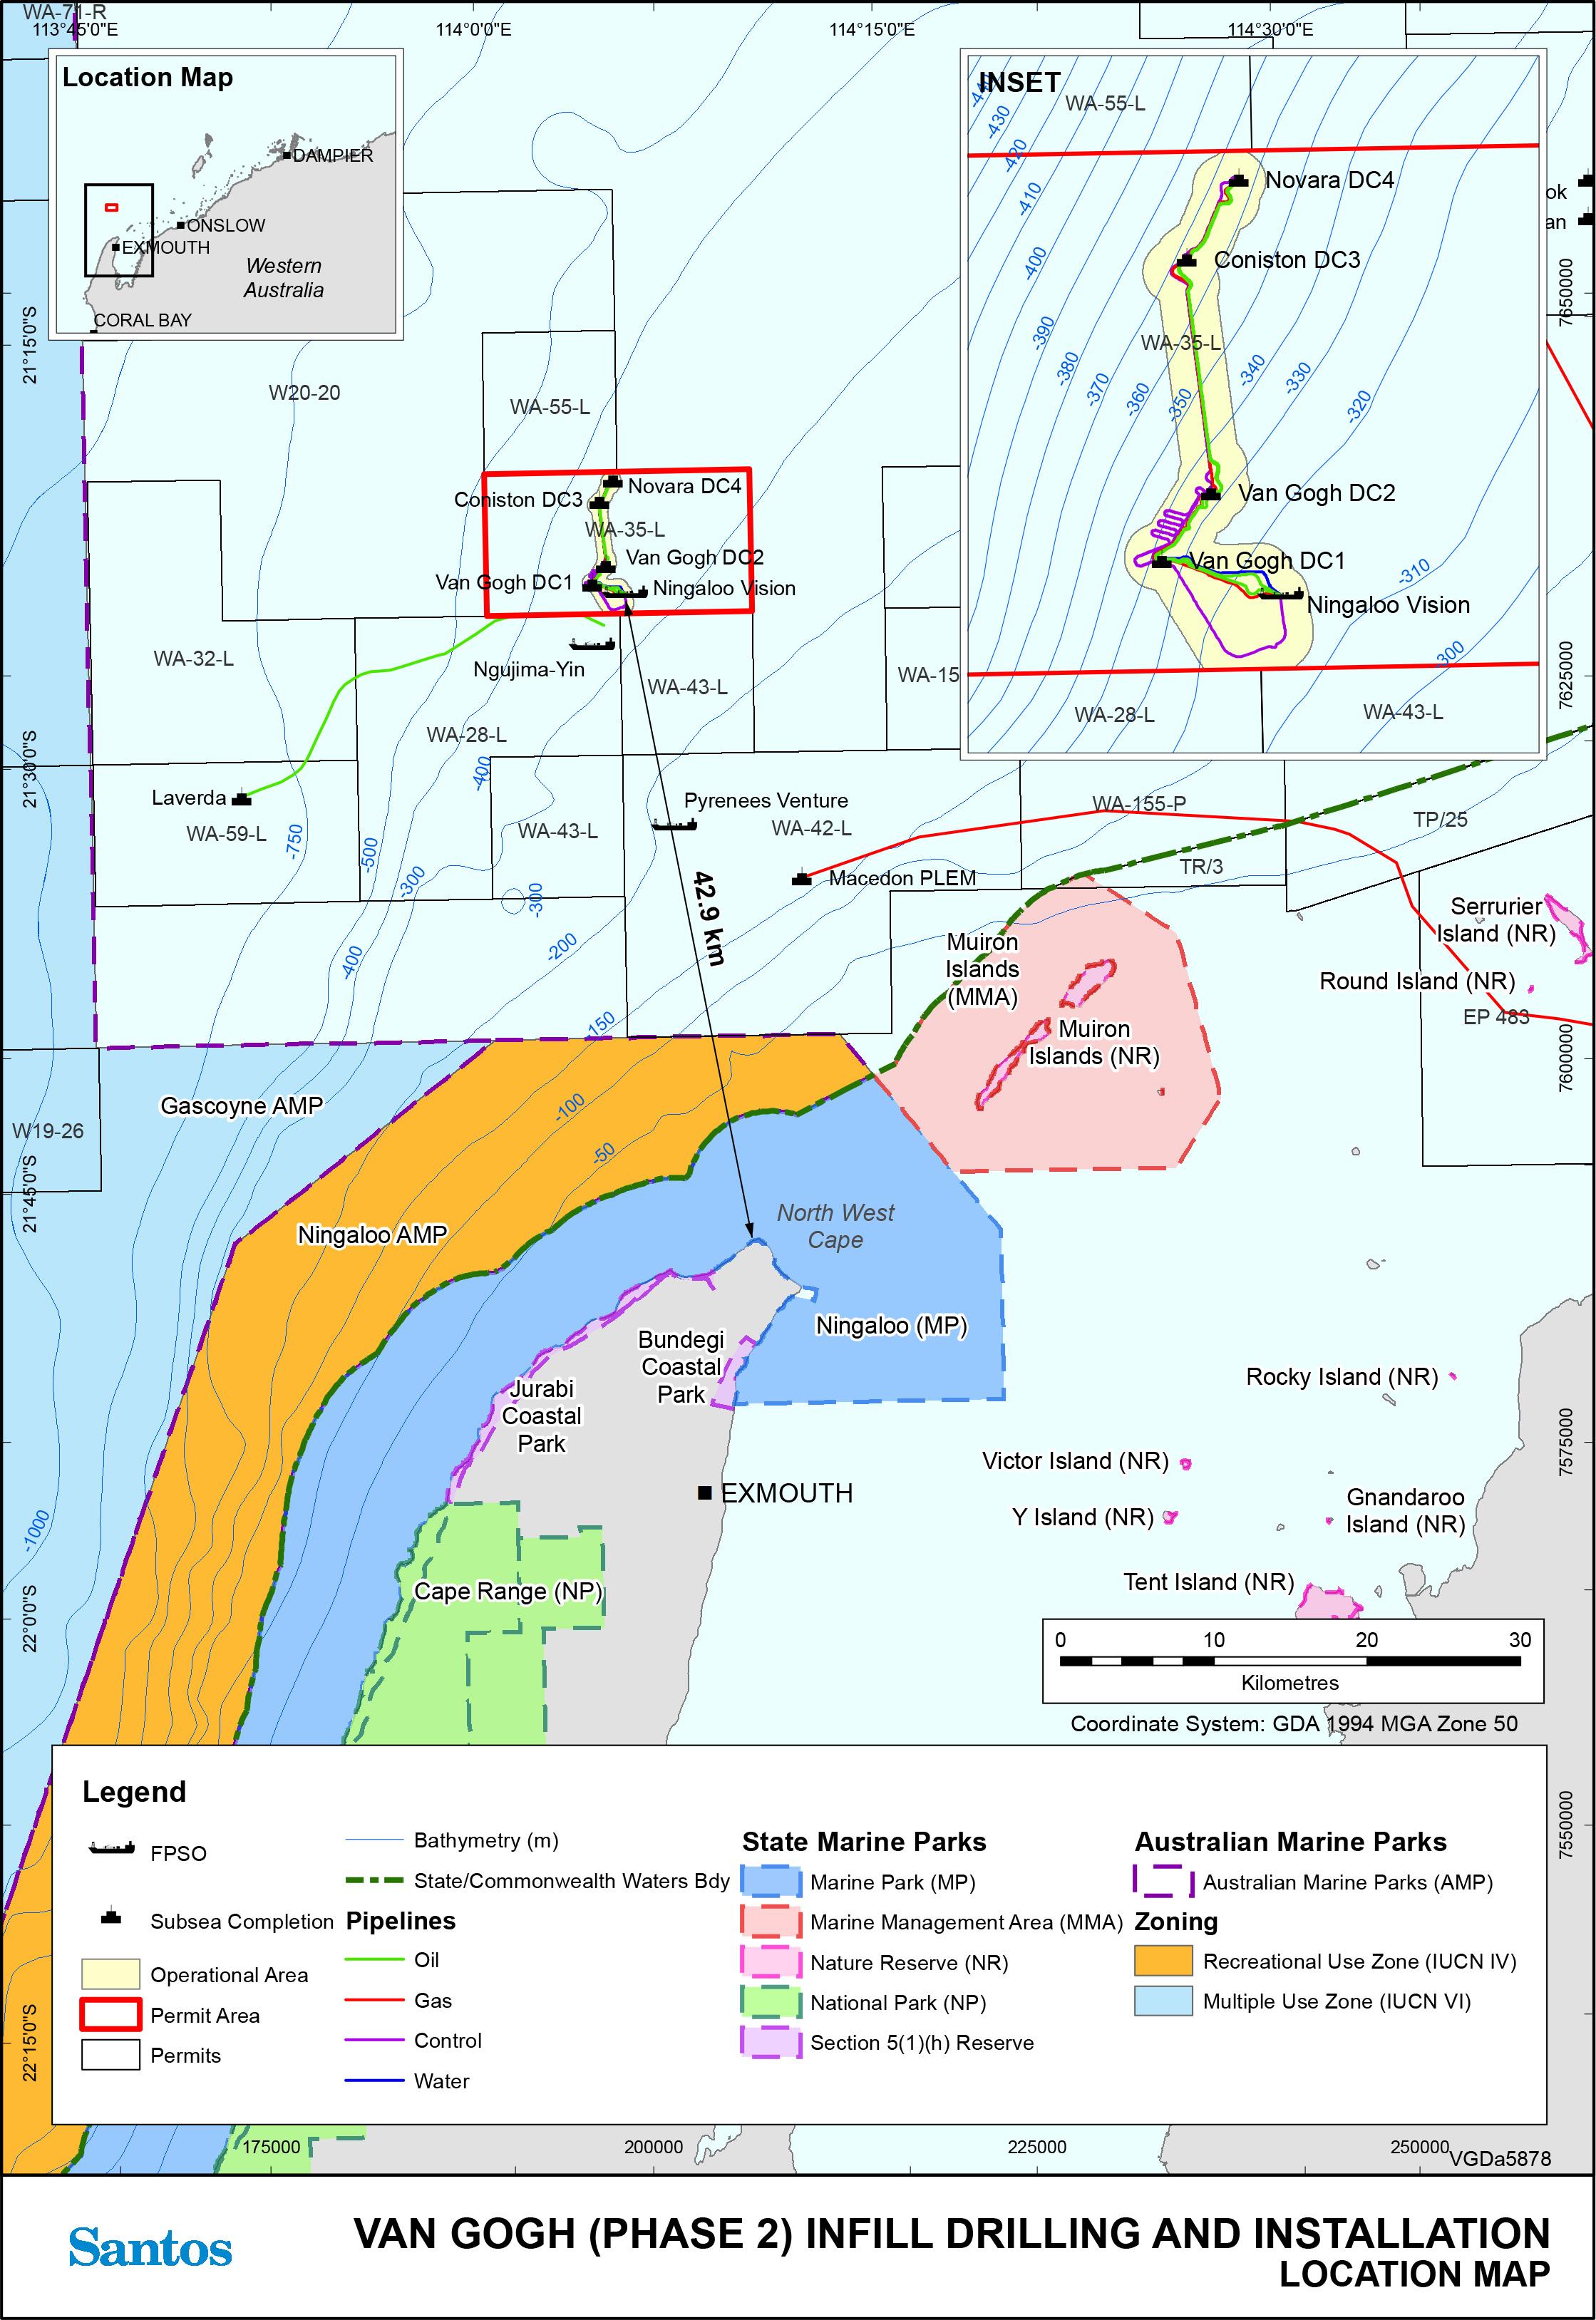 Location map - Activity: Van Gogh Infill Development Phase II (VGID2) Installation (refer to description)